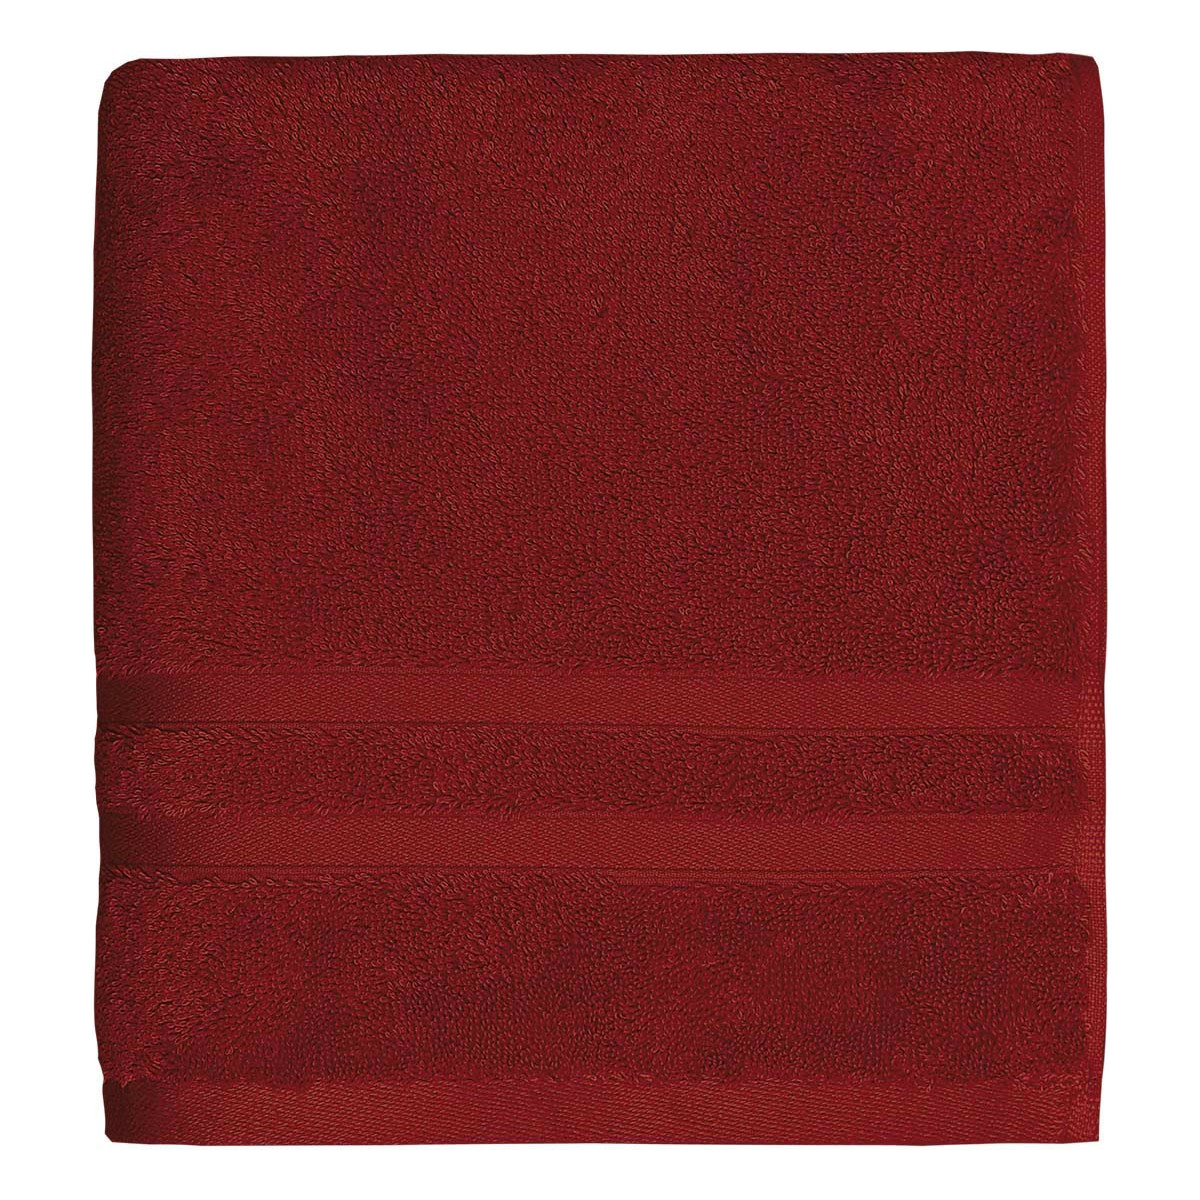 Drap de bain 600gr/m² Cardinal 70x140 cm